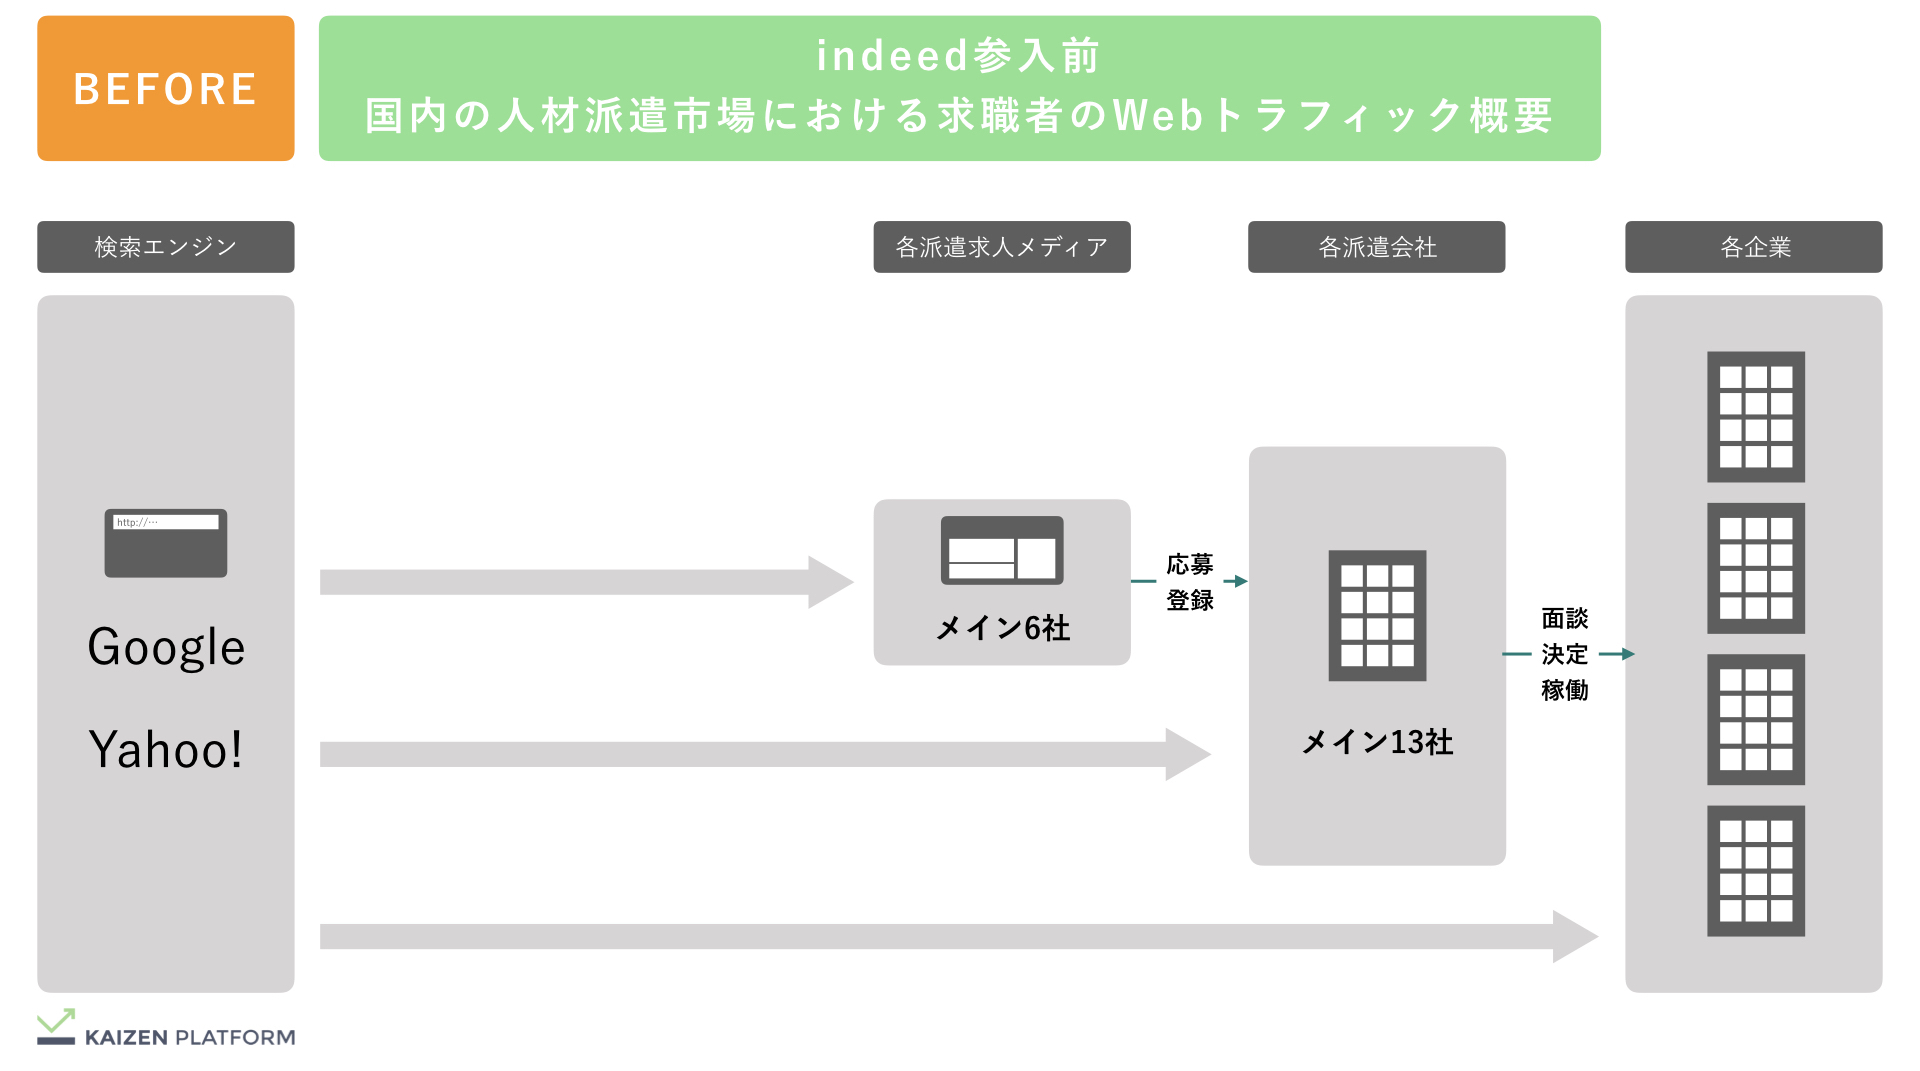 Kaizen Platform indeed参入前の人材派遣市場概況